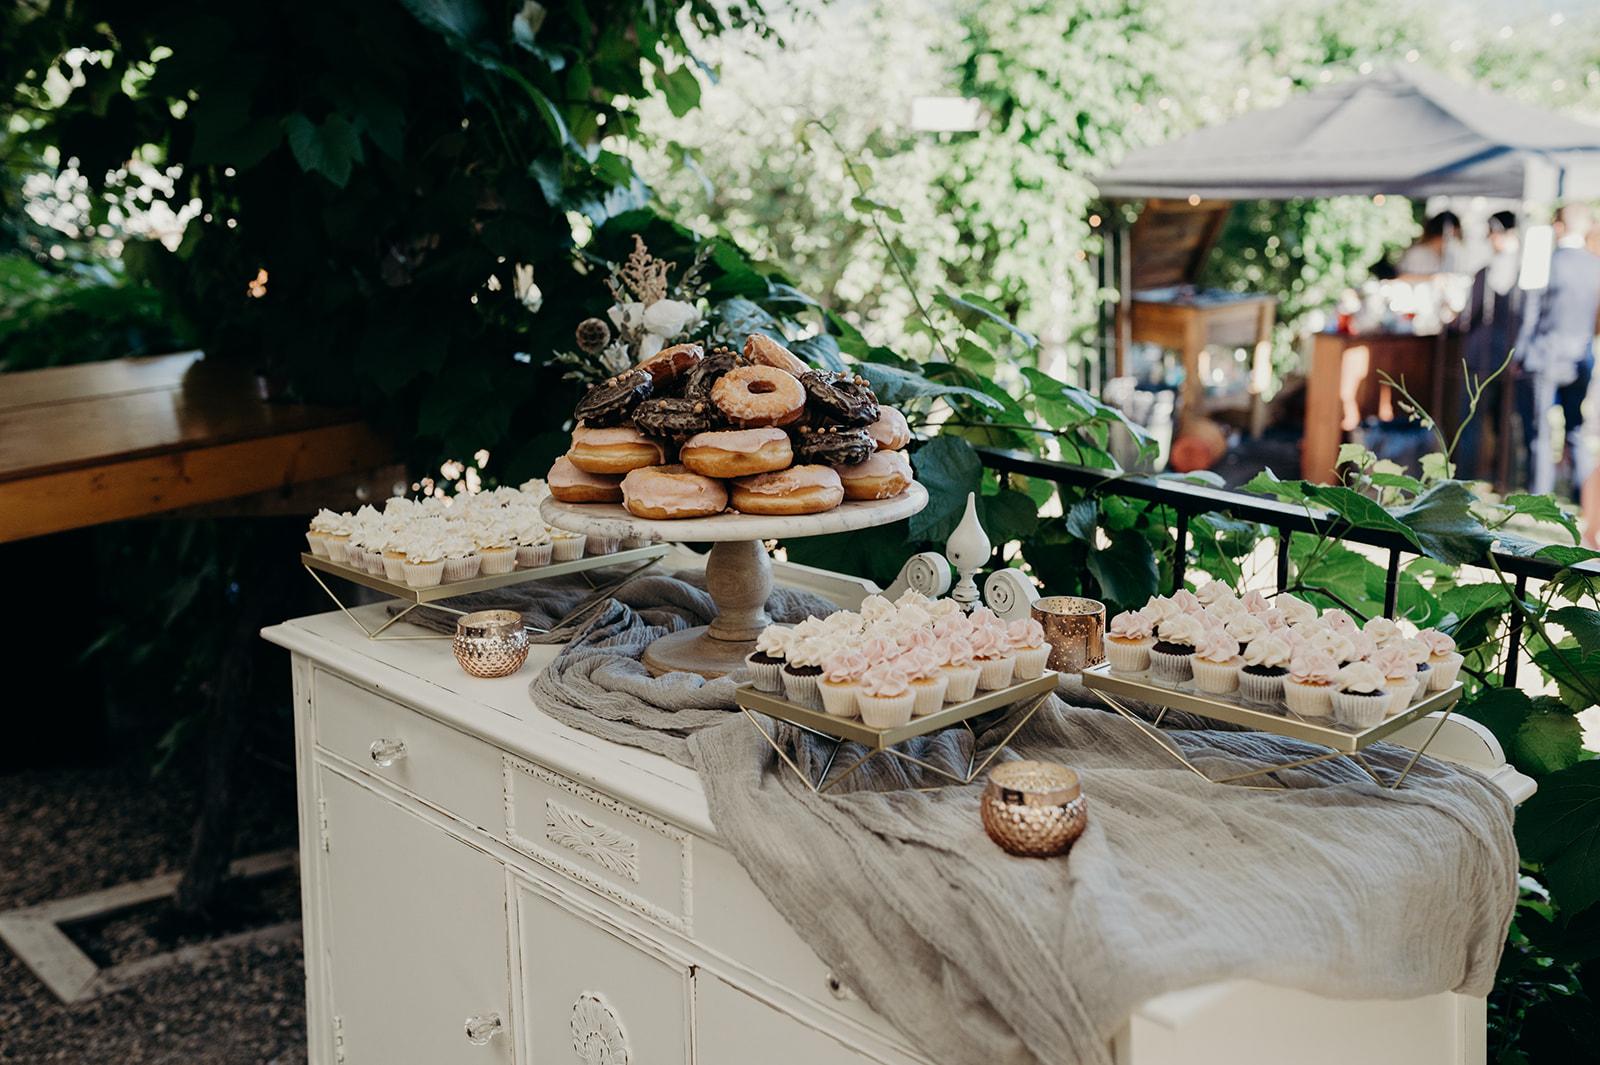 Kelowna Wedding Donuts and Cupcakes.jpg